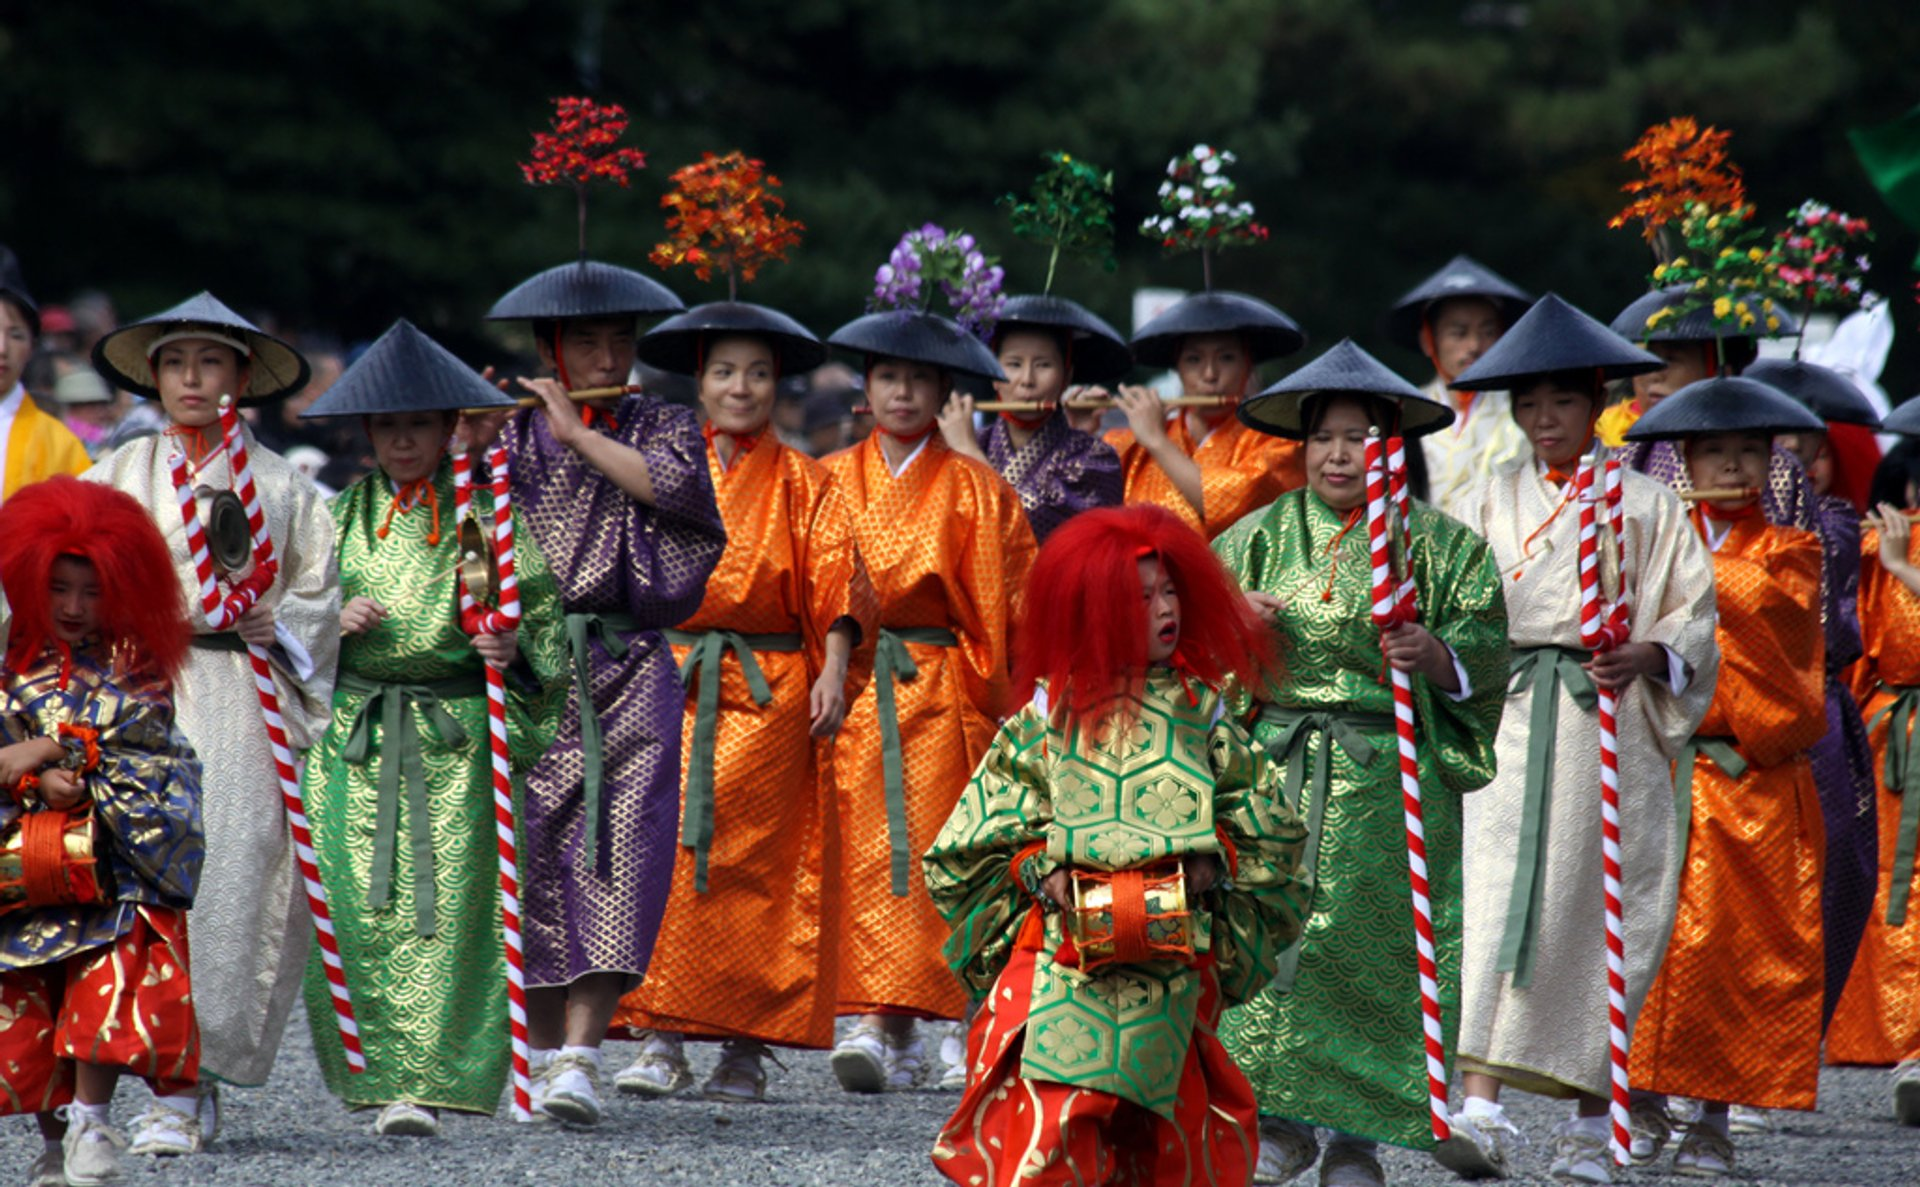 Jidai Matsuri (Festival) in Kyoto 2020 - Best Time